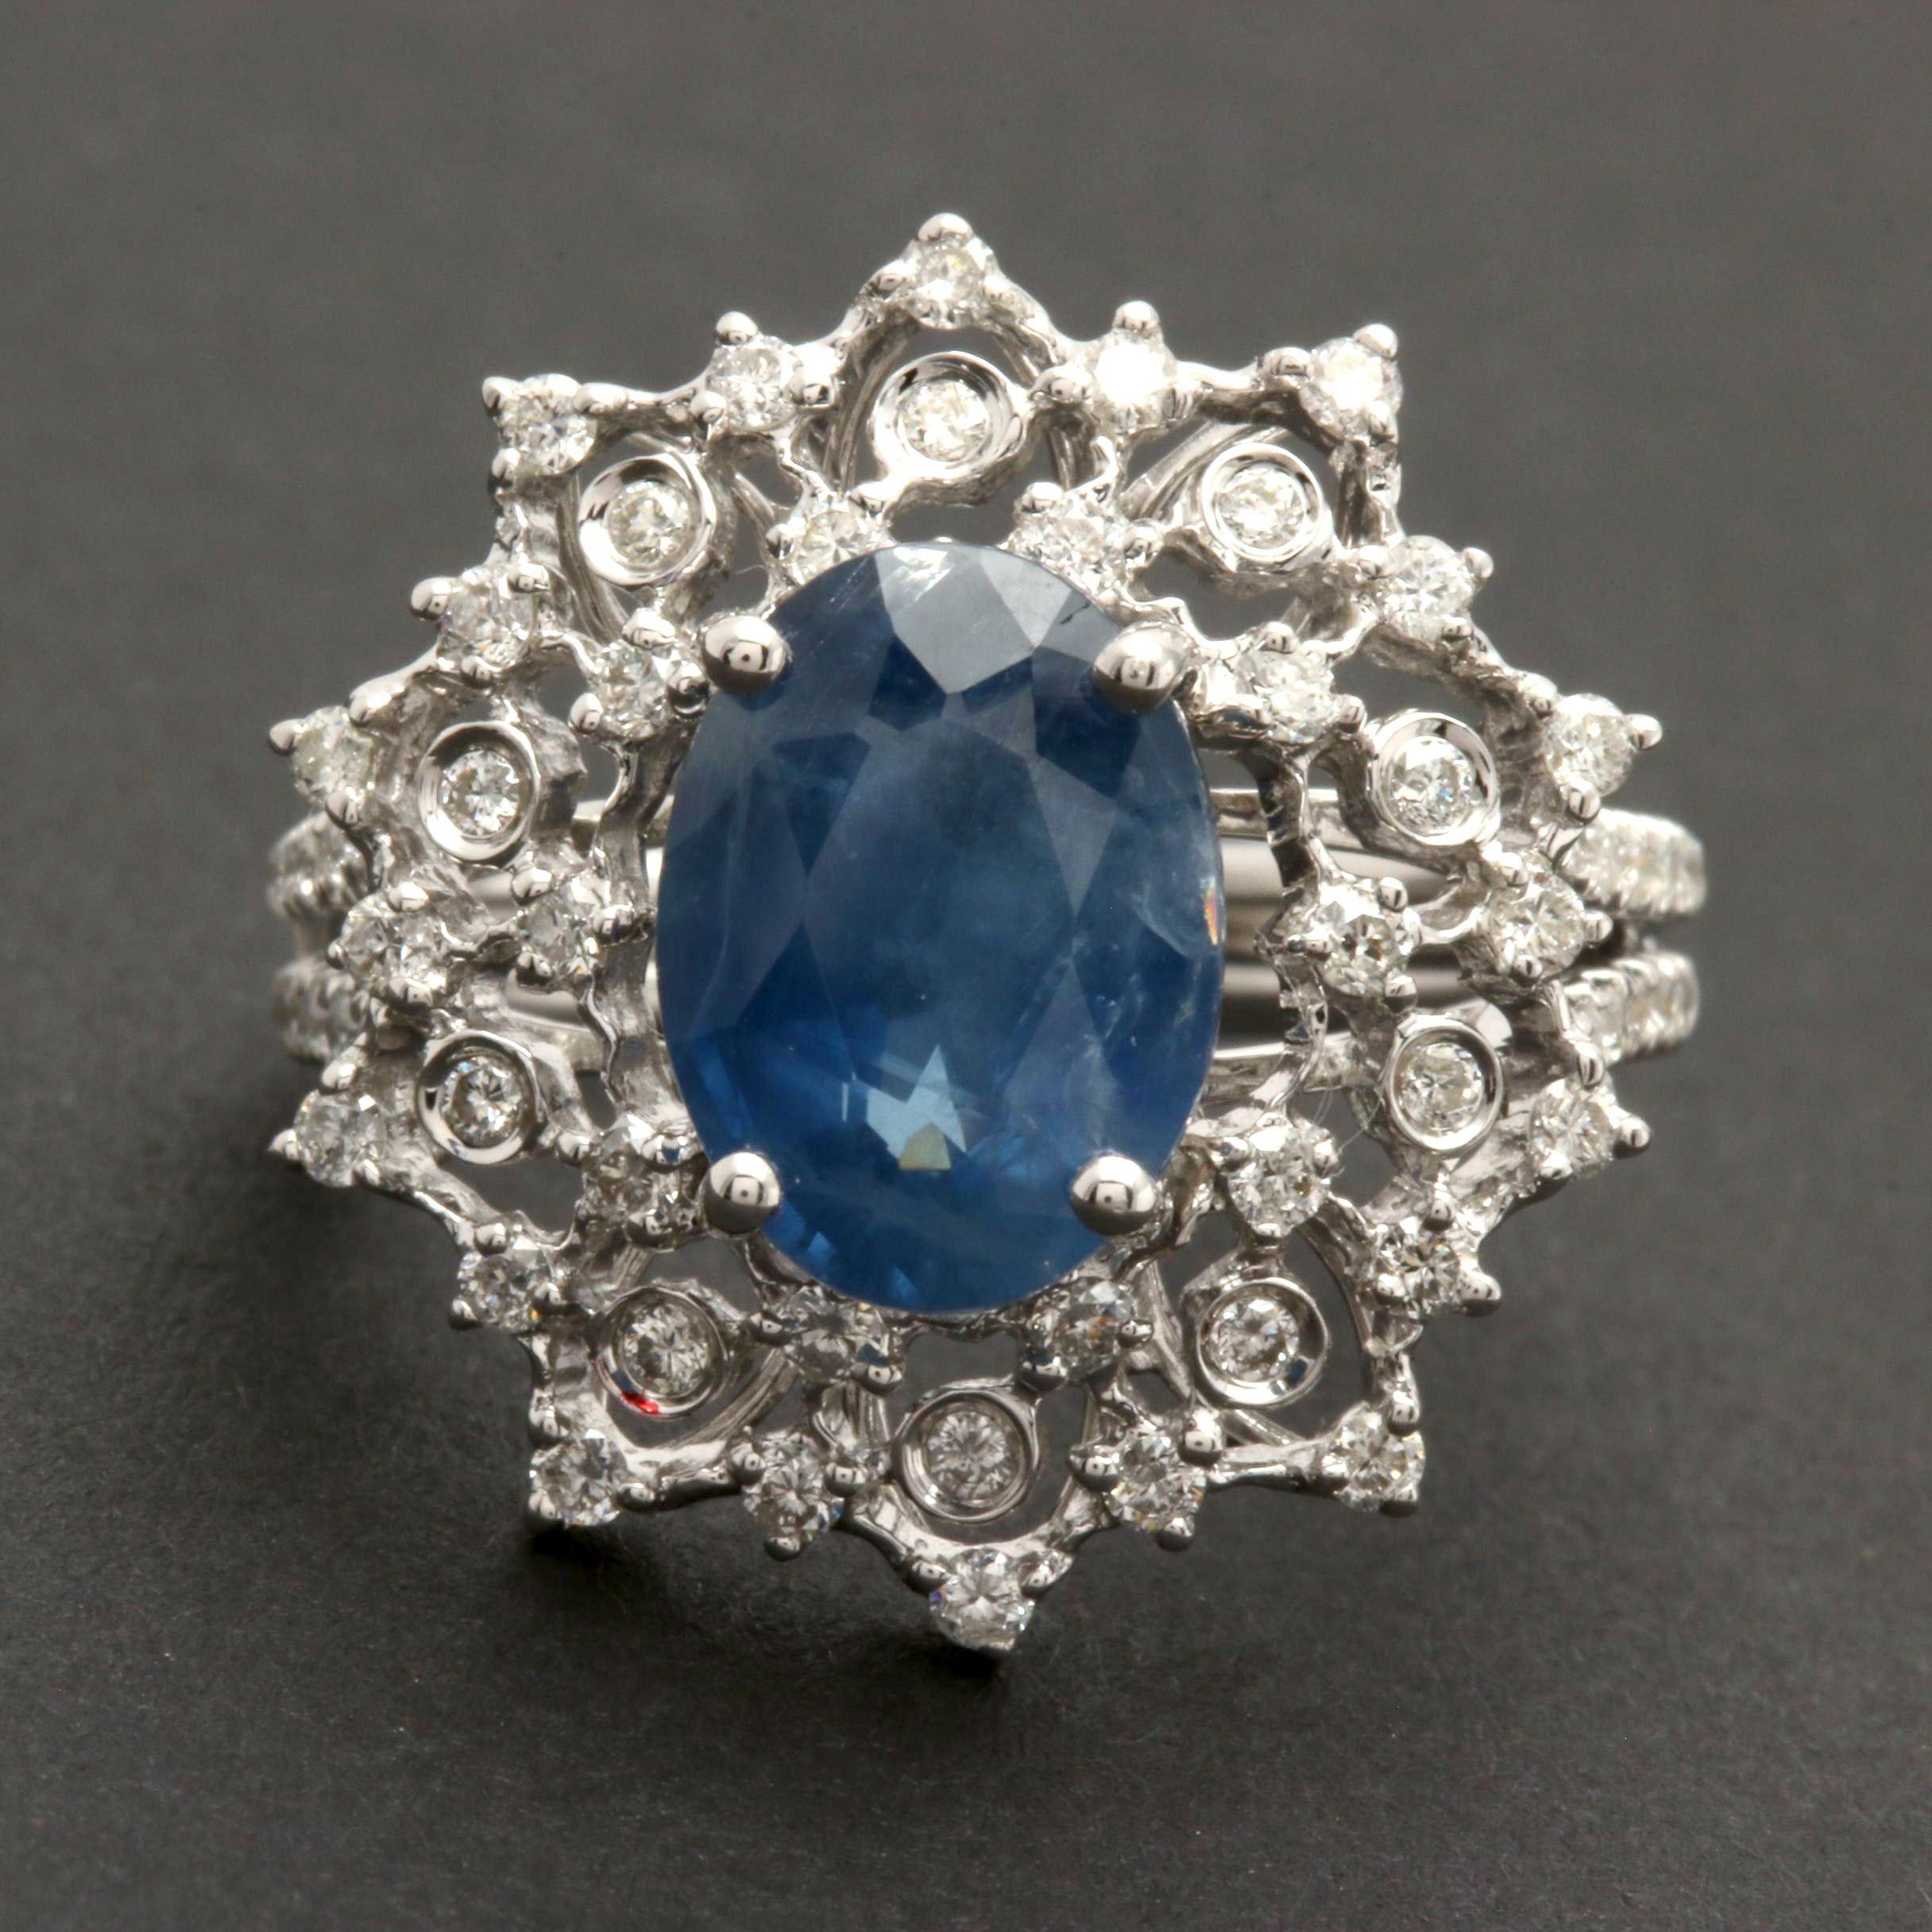 M. Christoff 18K White Gold 3.66 CT Unheated Blue Sapphire and Diamond Ring